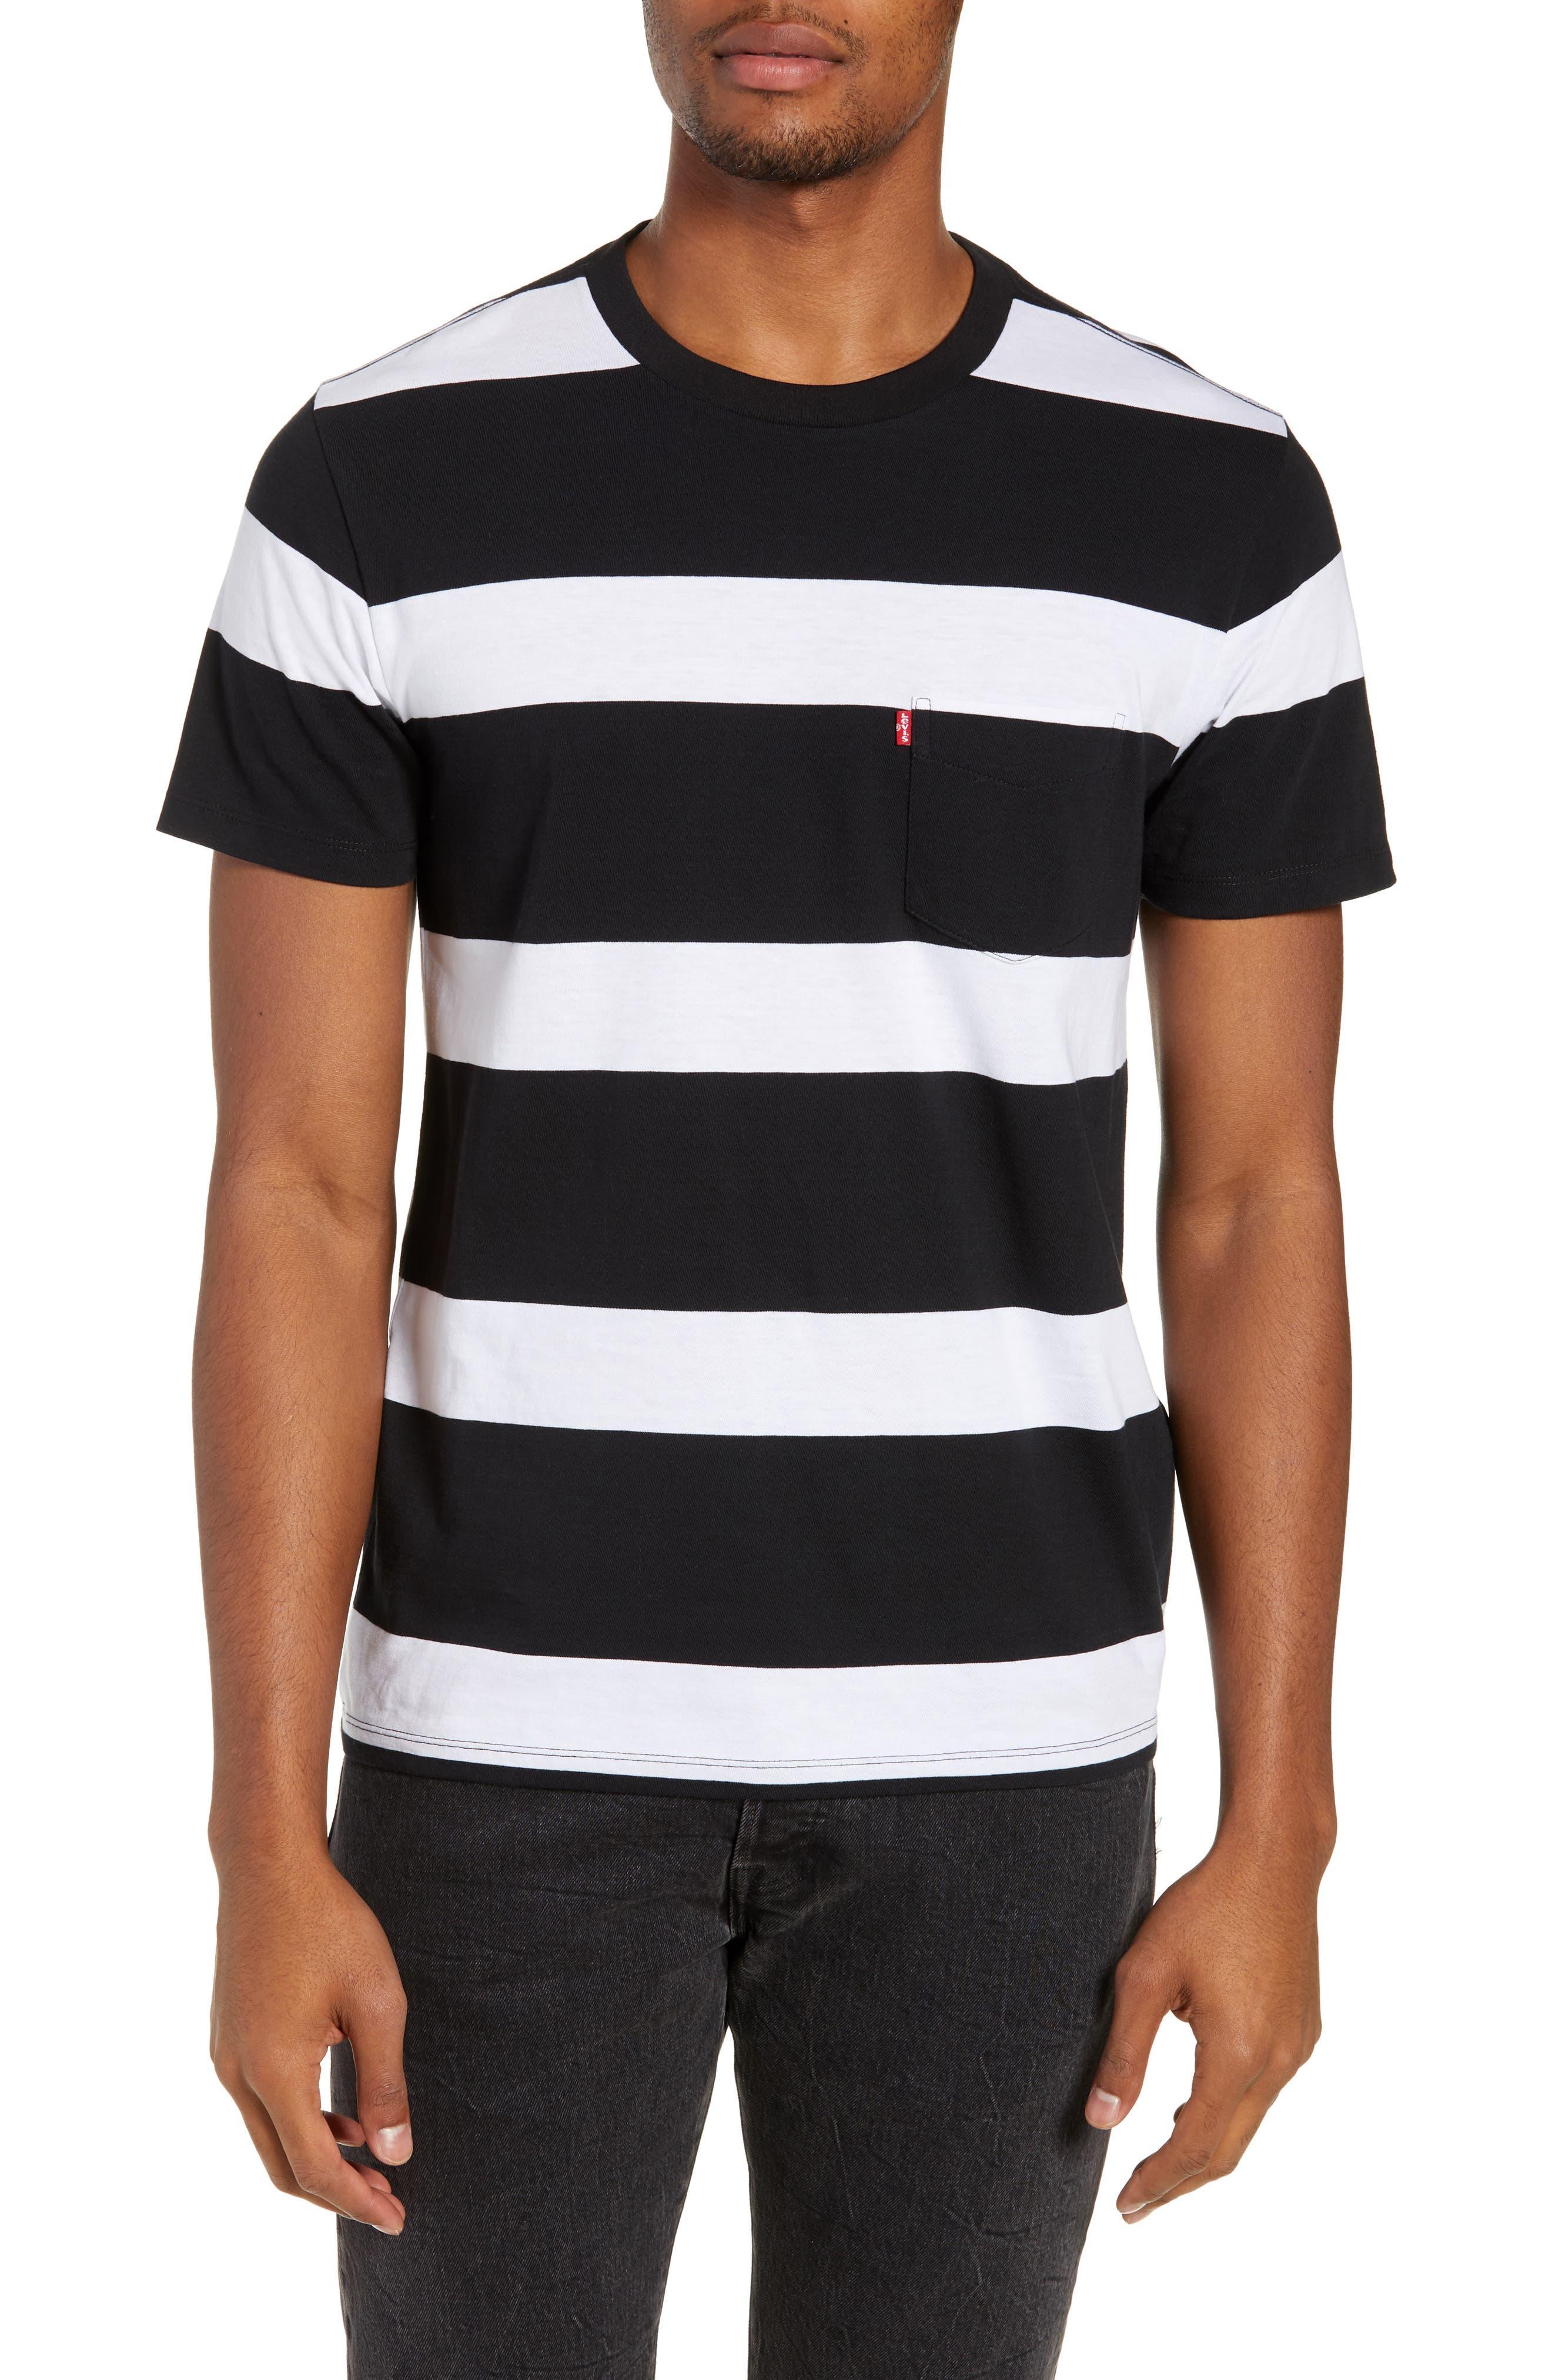 Pocket T-Shirt,                         Main,                         color, BLACK/ WHITE STRIPES